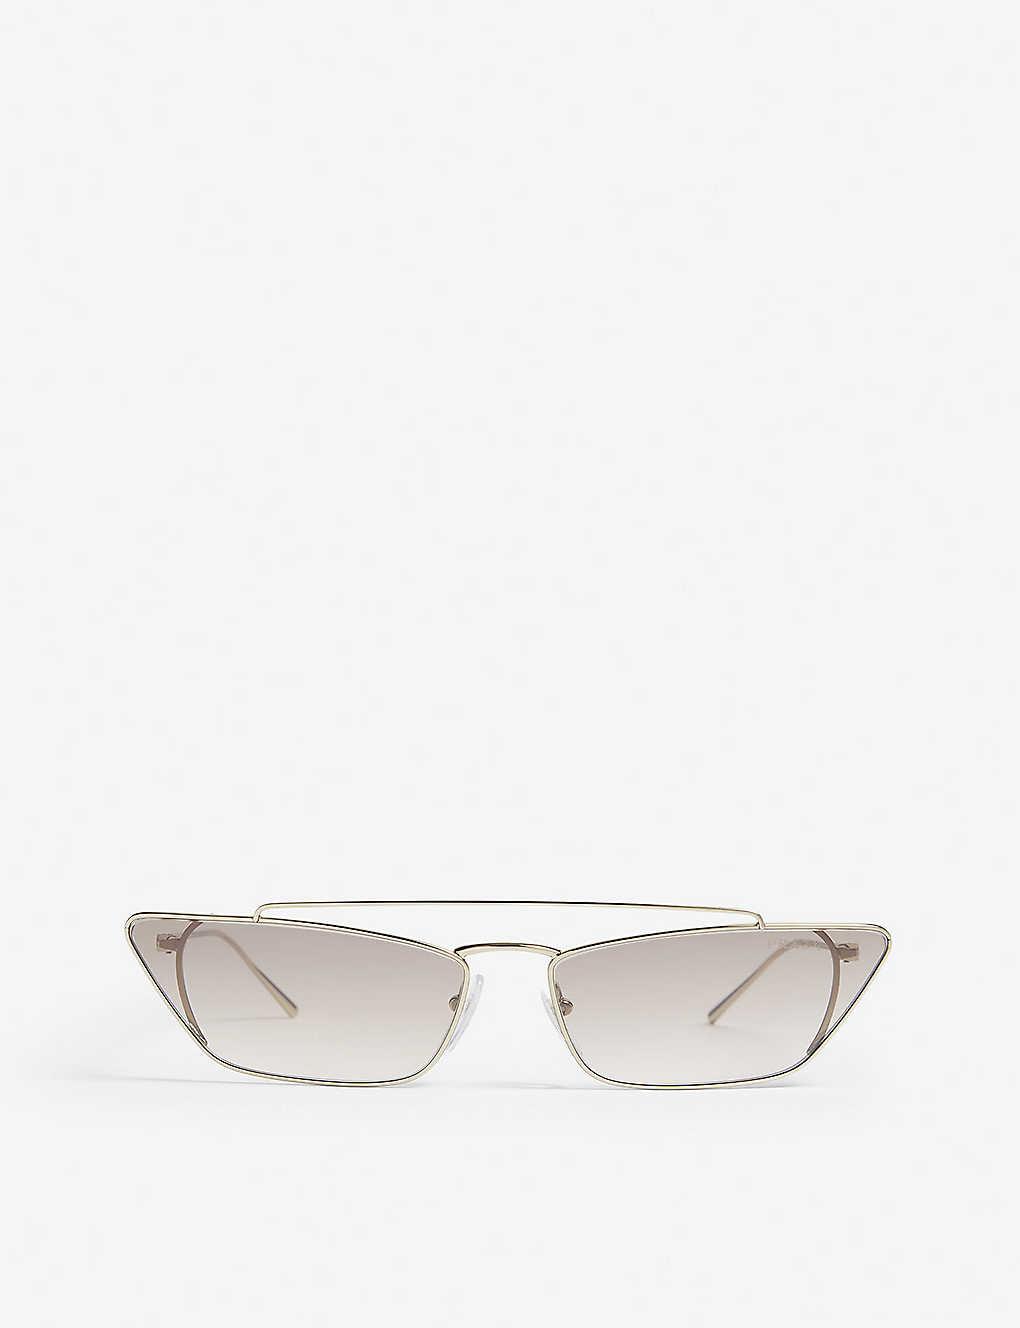 9c1cd14879 PRADA - Ultravox S181-1202 cat-eye sunglasses